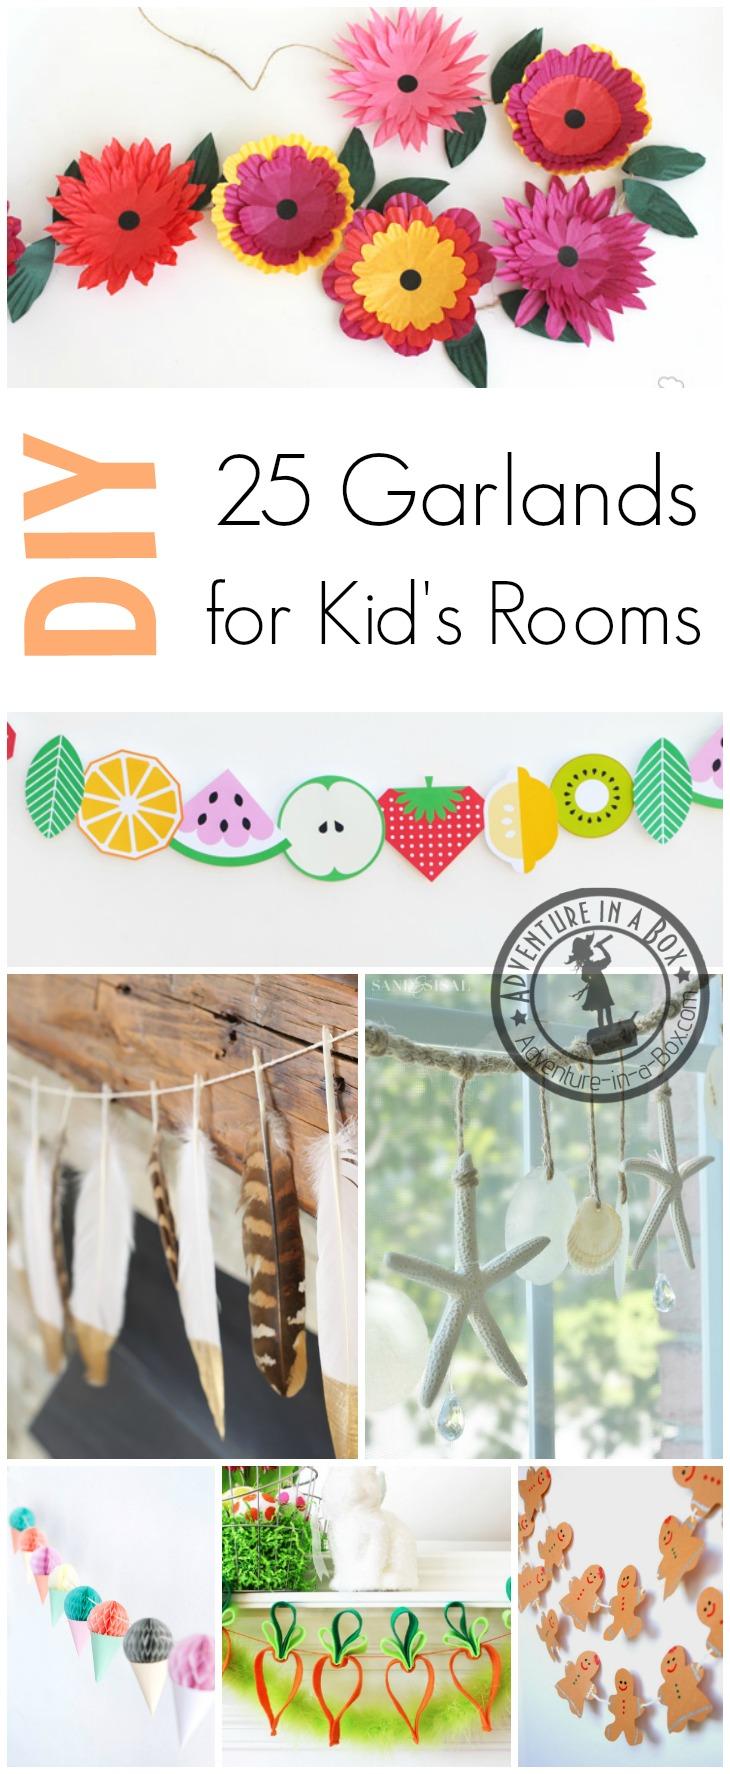 Diy Seasonal Garlands For Kids Rooms Adventure In A Box